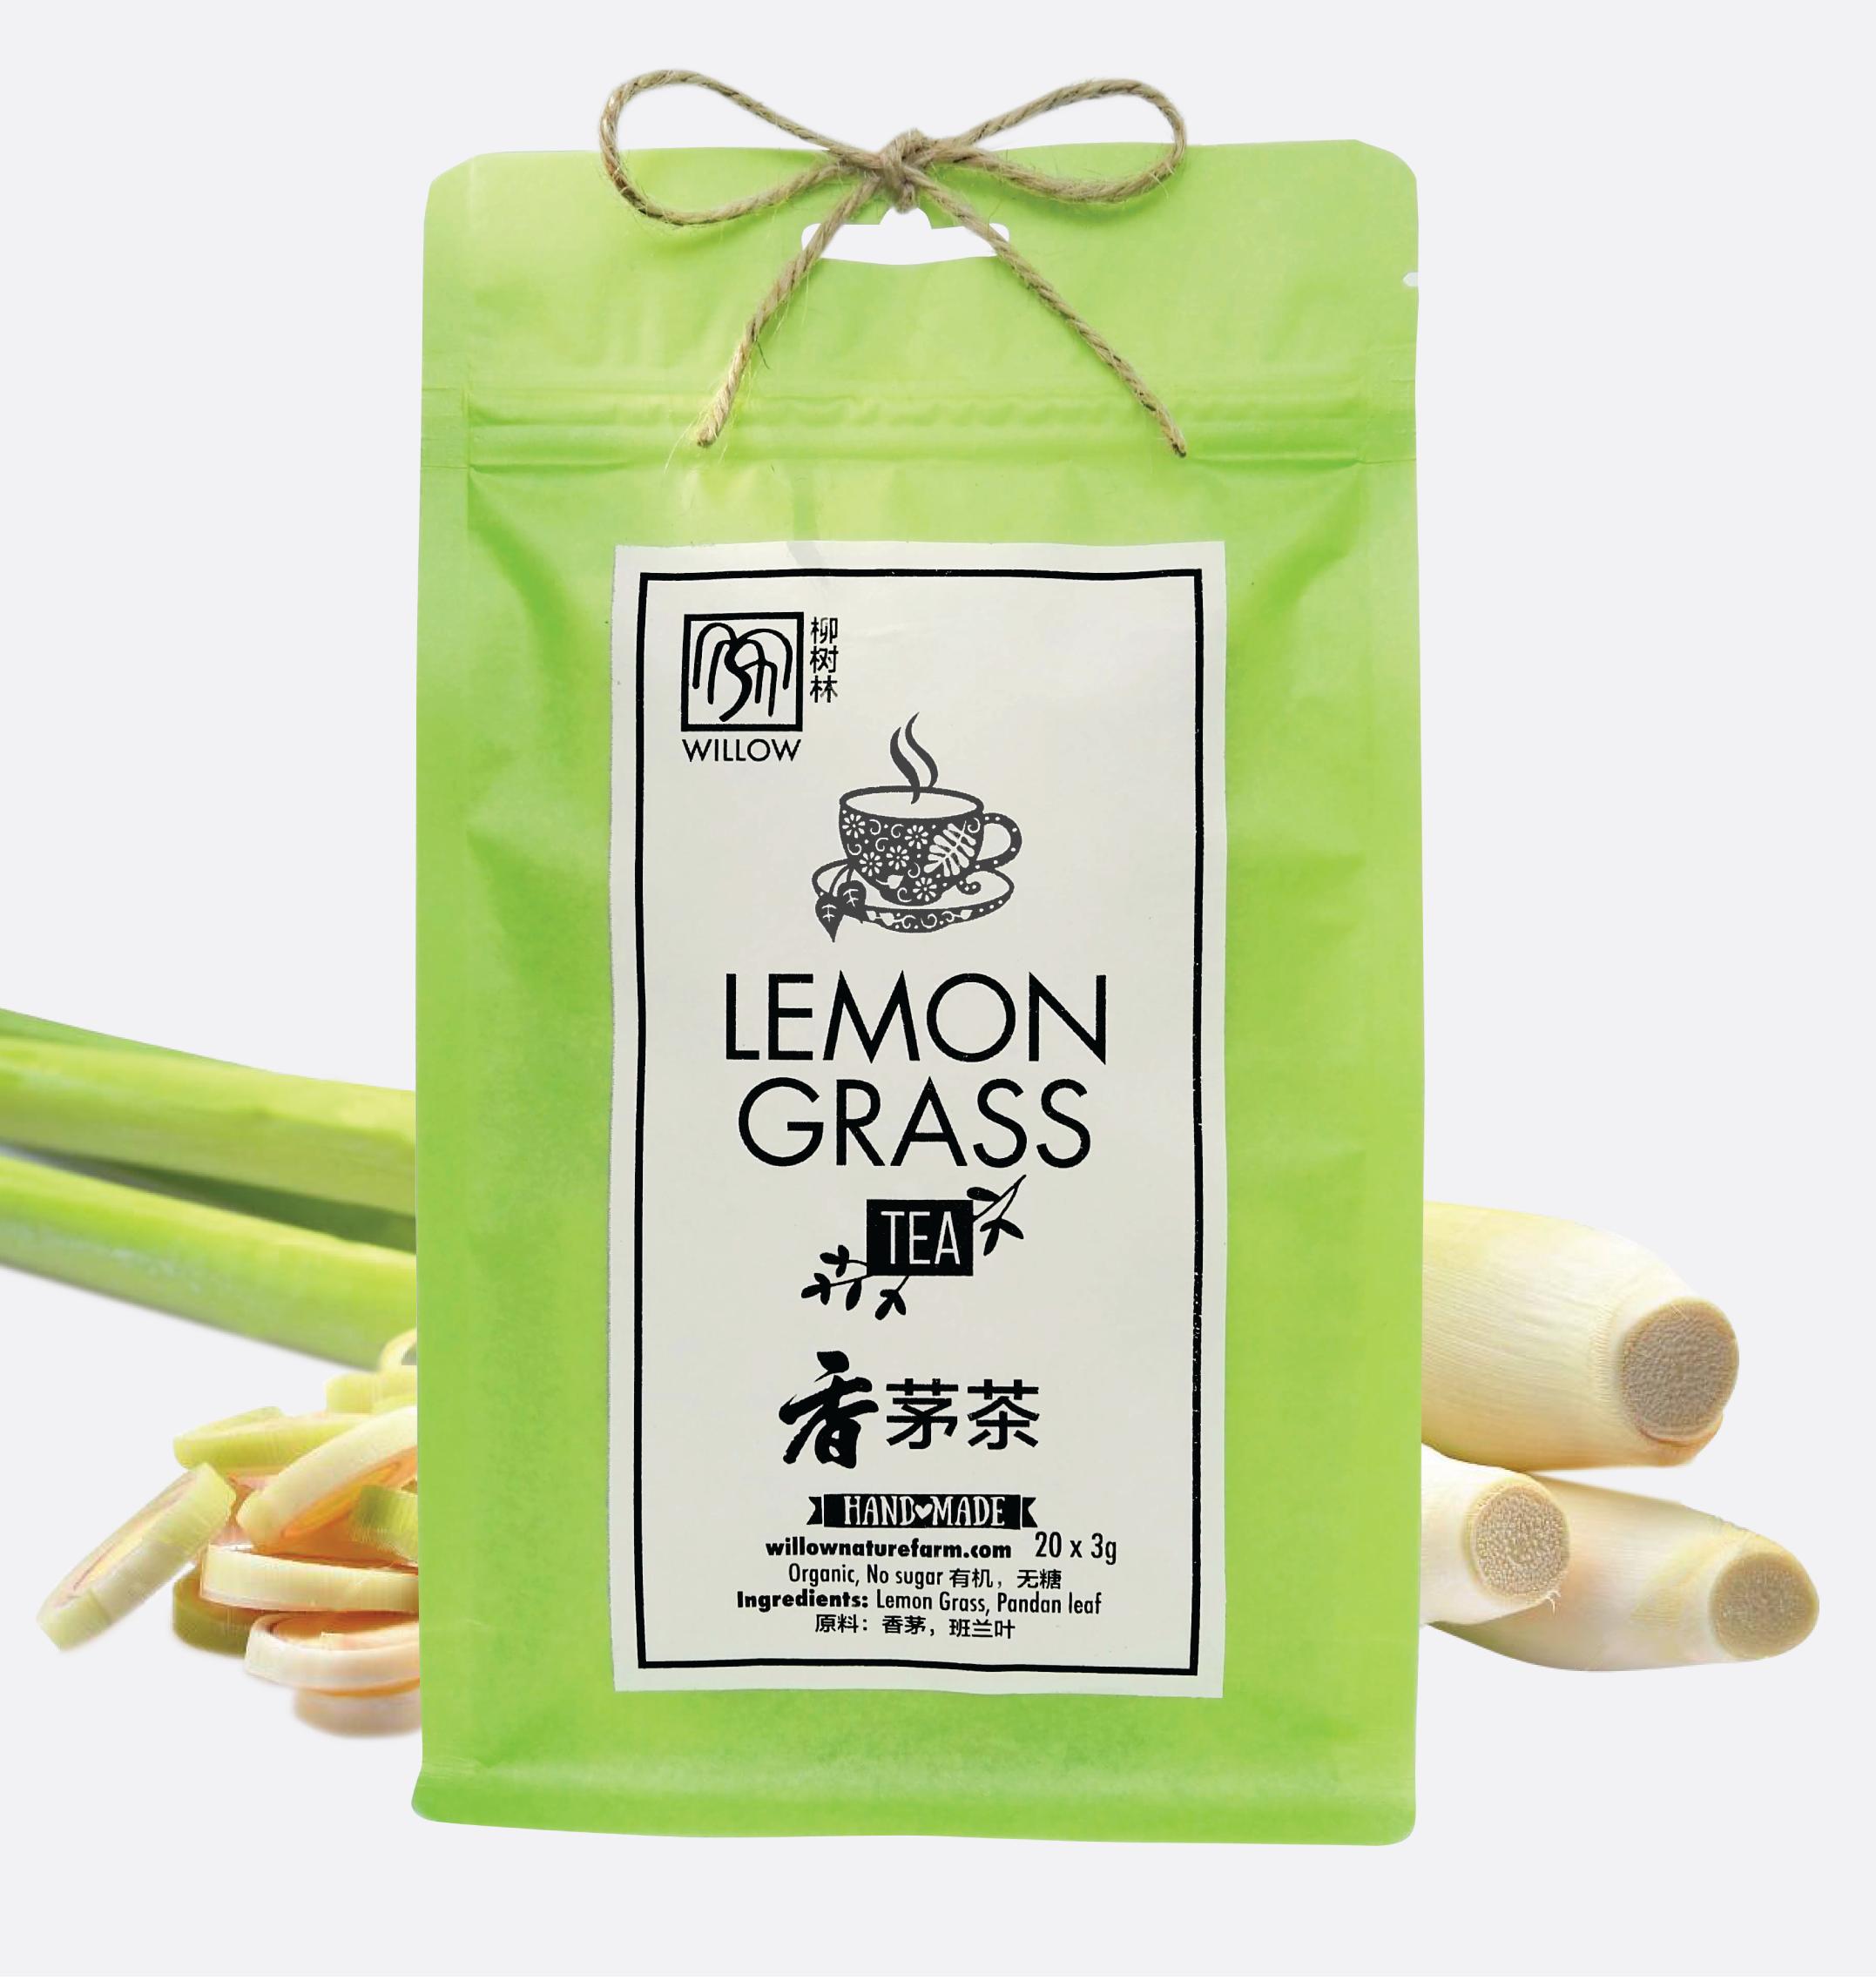 Lemon Grass Product pics-01.png